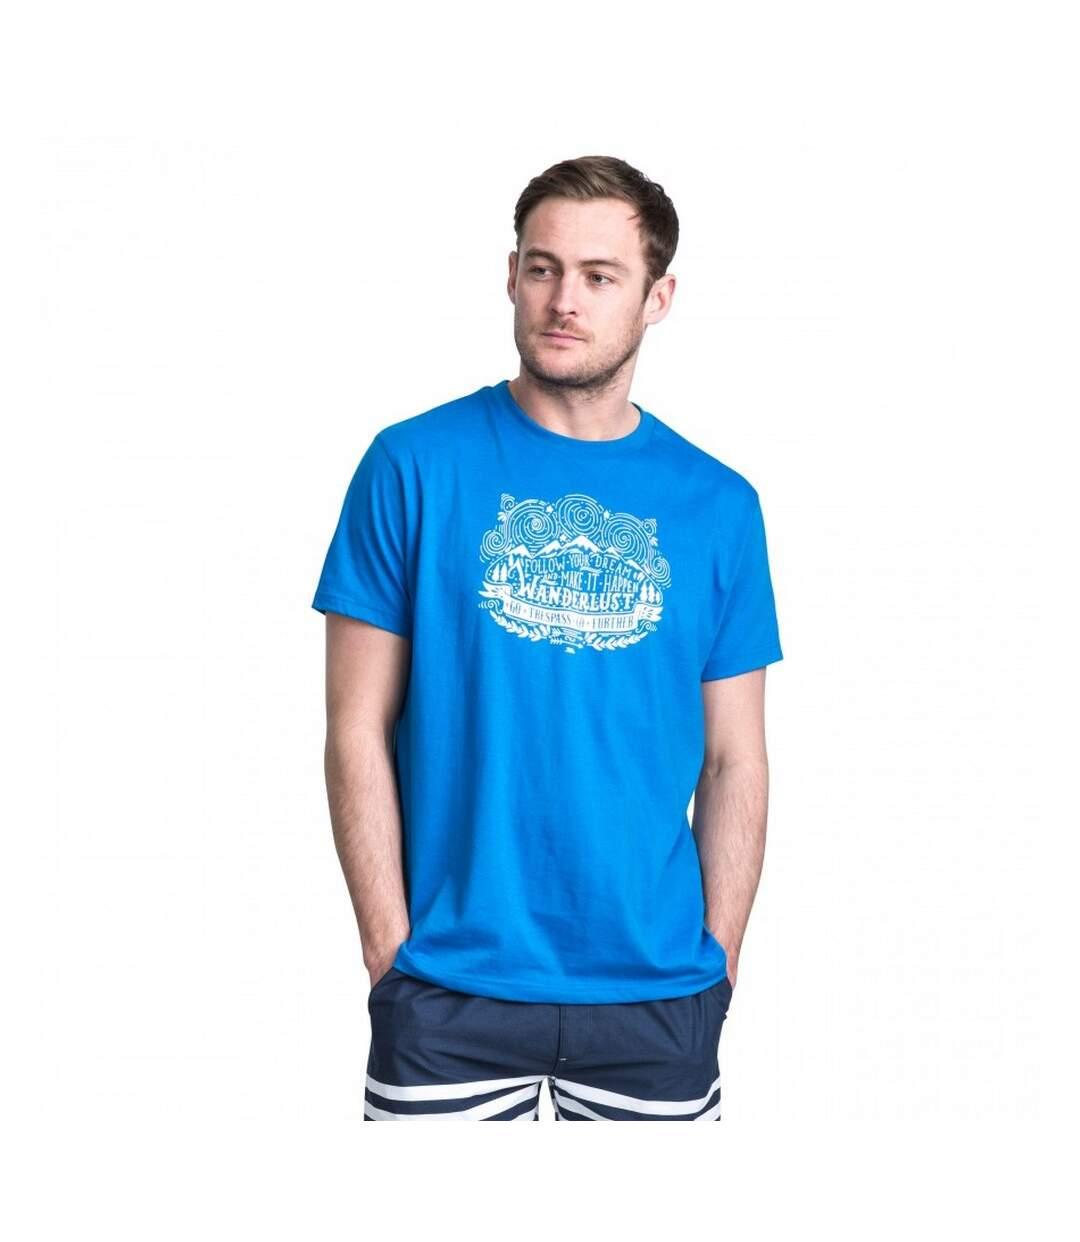 Trespass Mens Hainey Short Sleeve T-Shirt (Bright Blue) - UTTP3362